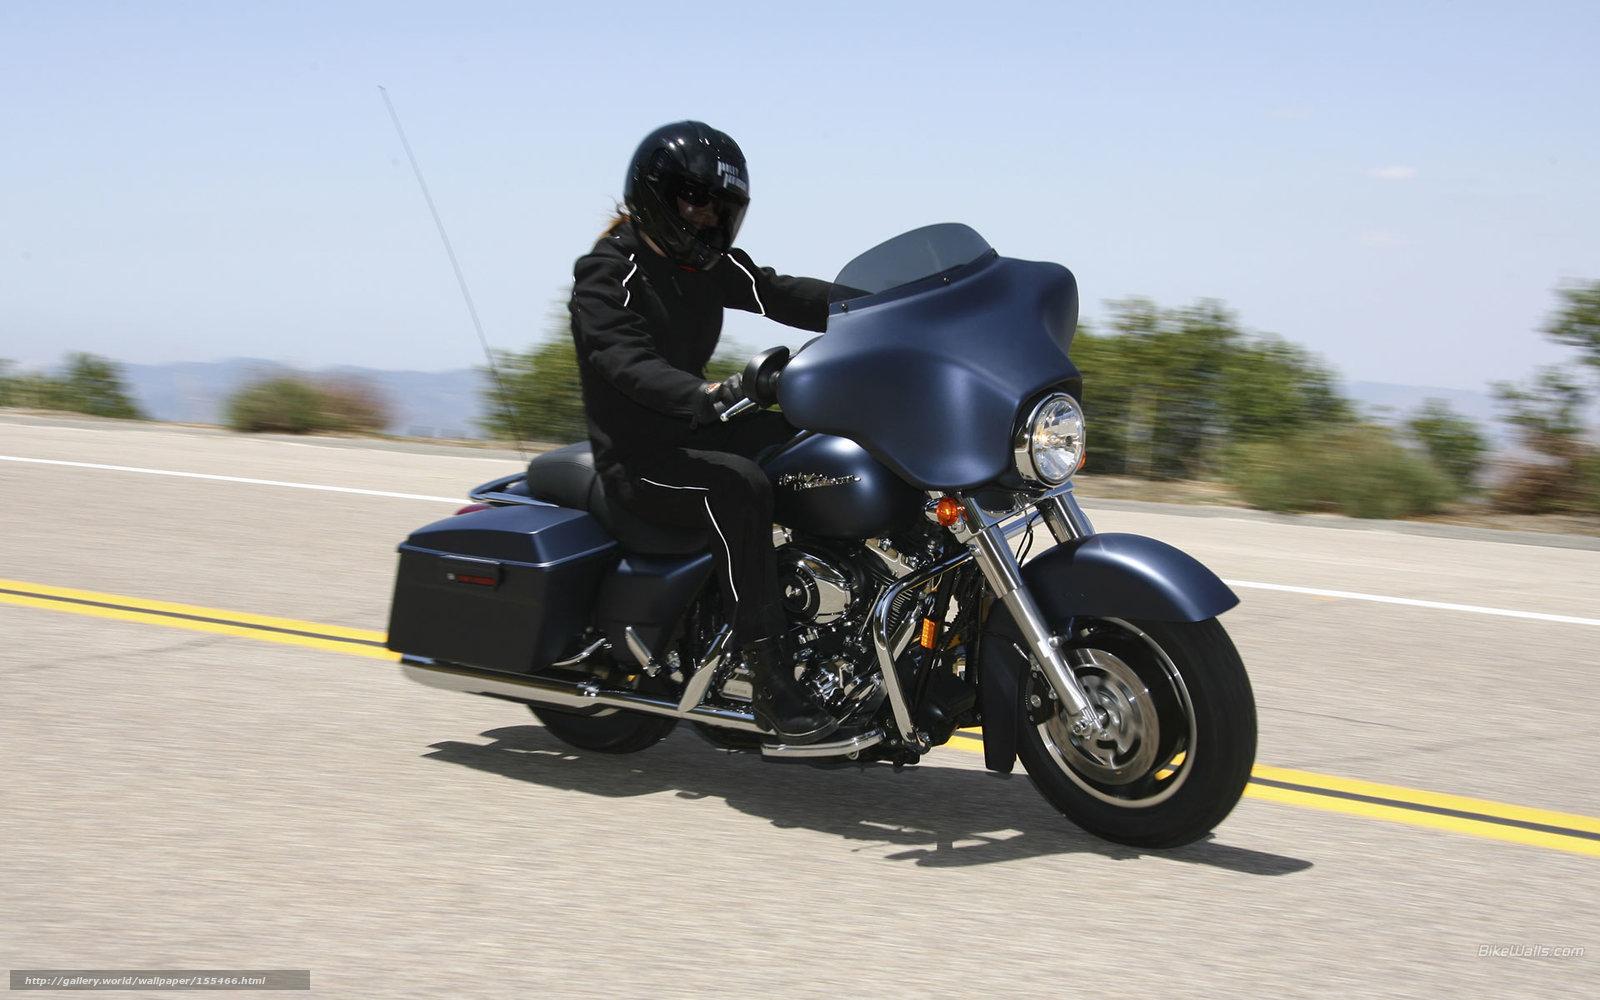 motorcycle harley street glide wallpaper - photo #8